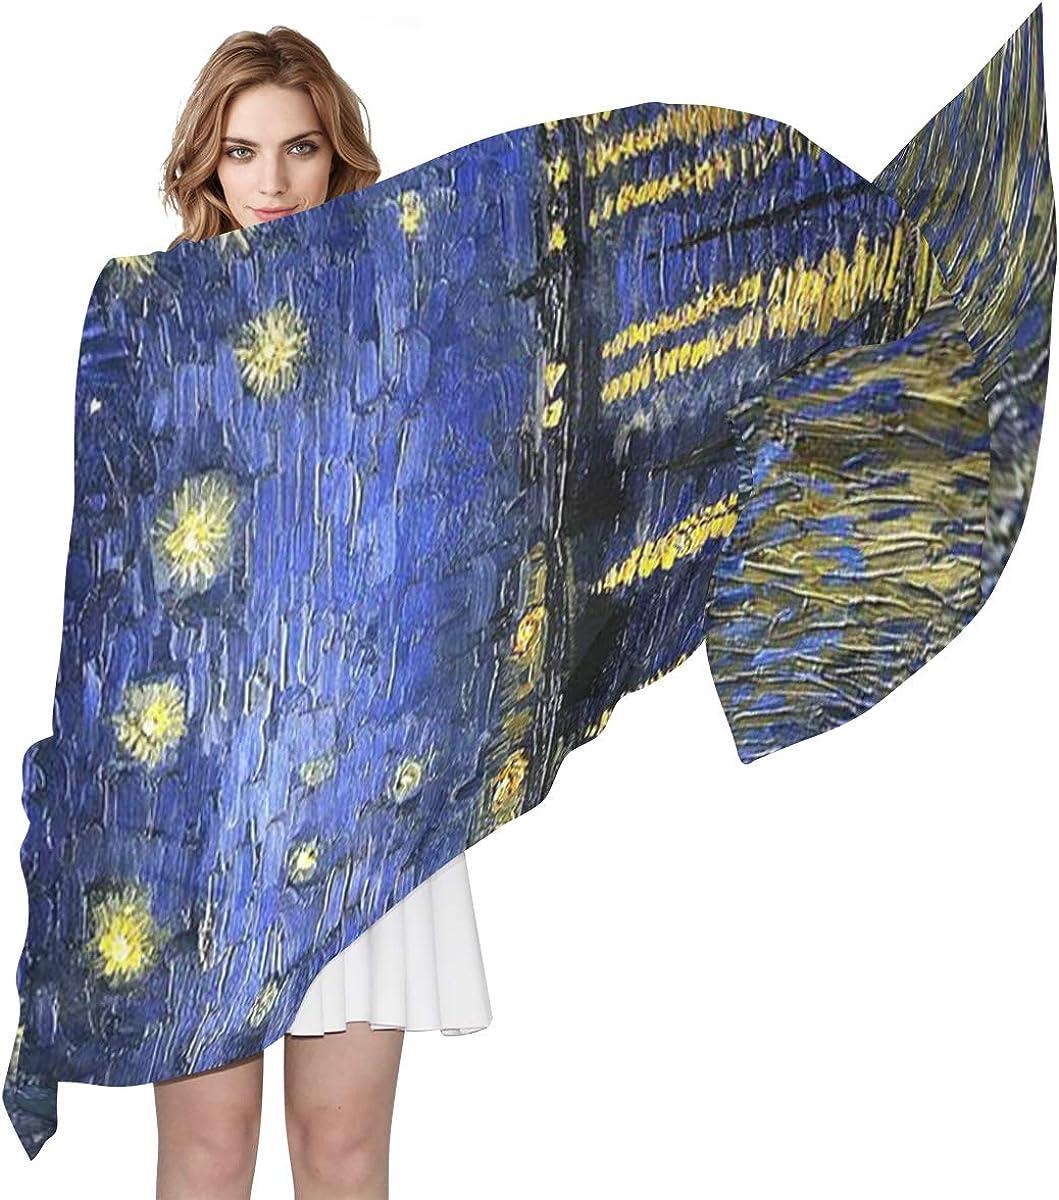 Women Accessories Silk Scarf Long Cape Beach Towel Chiffon Shawl Print Floral